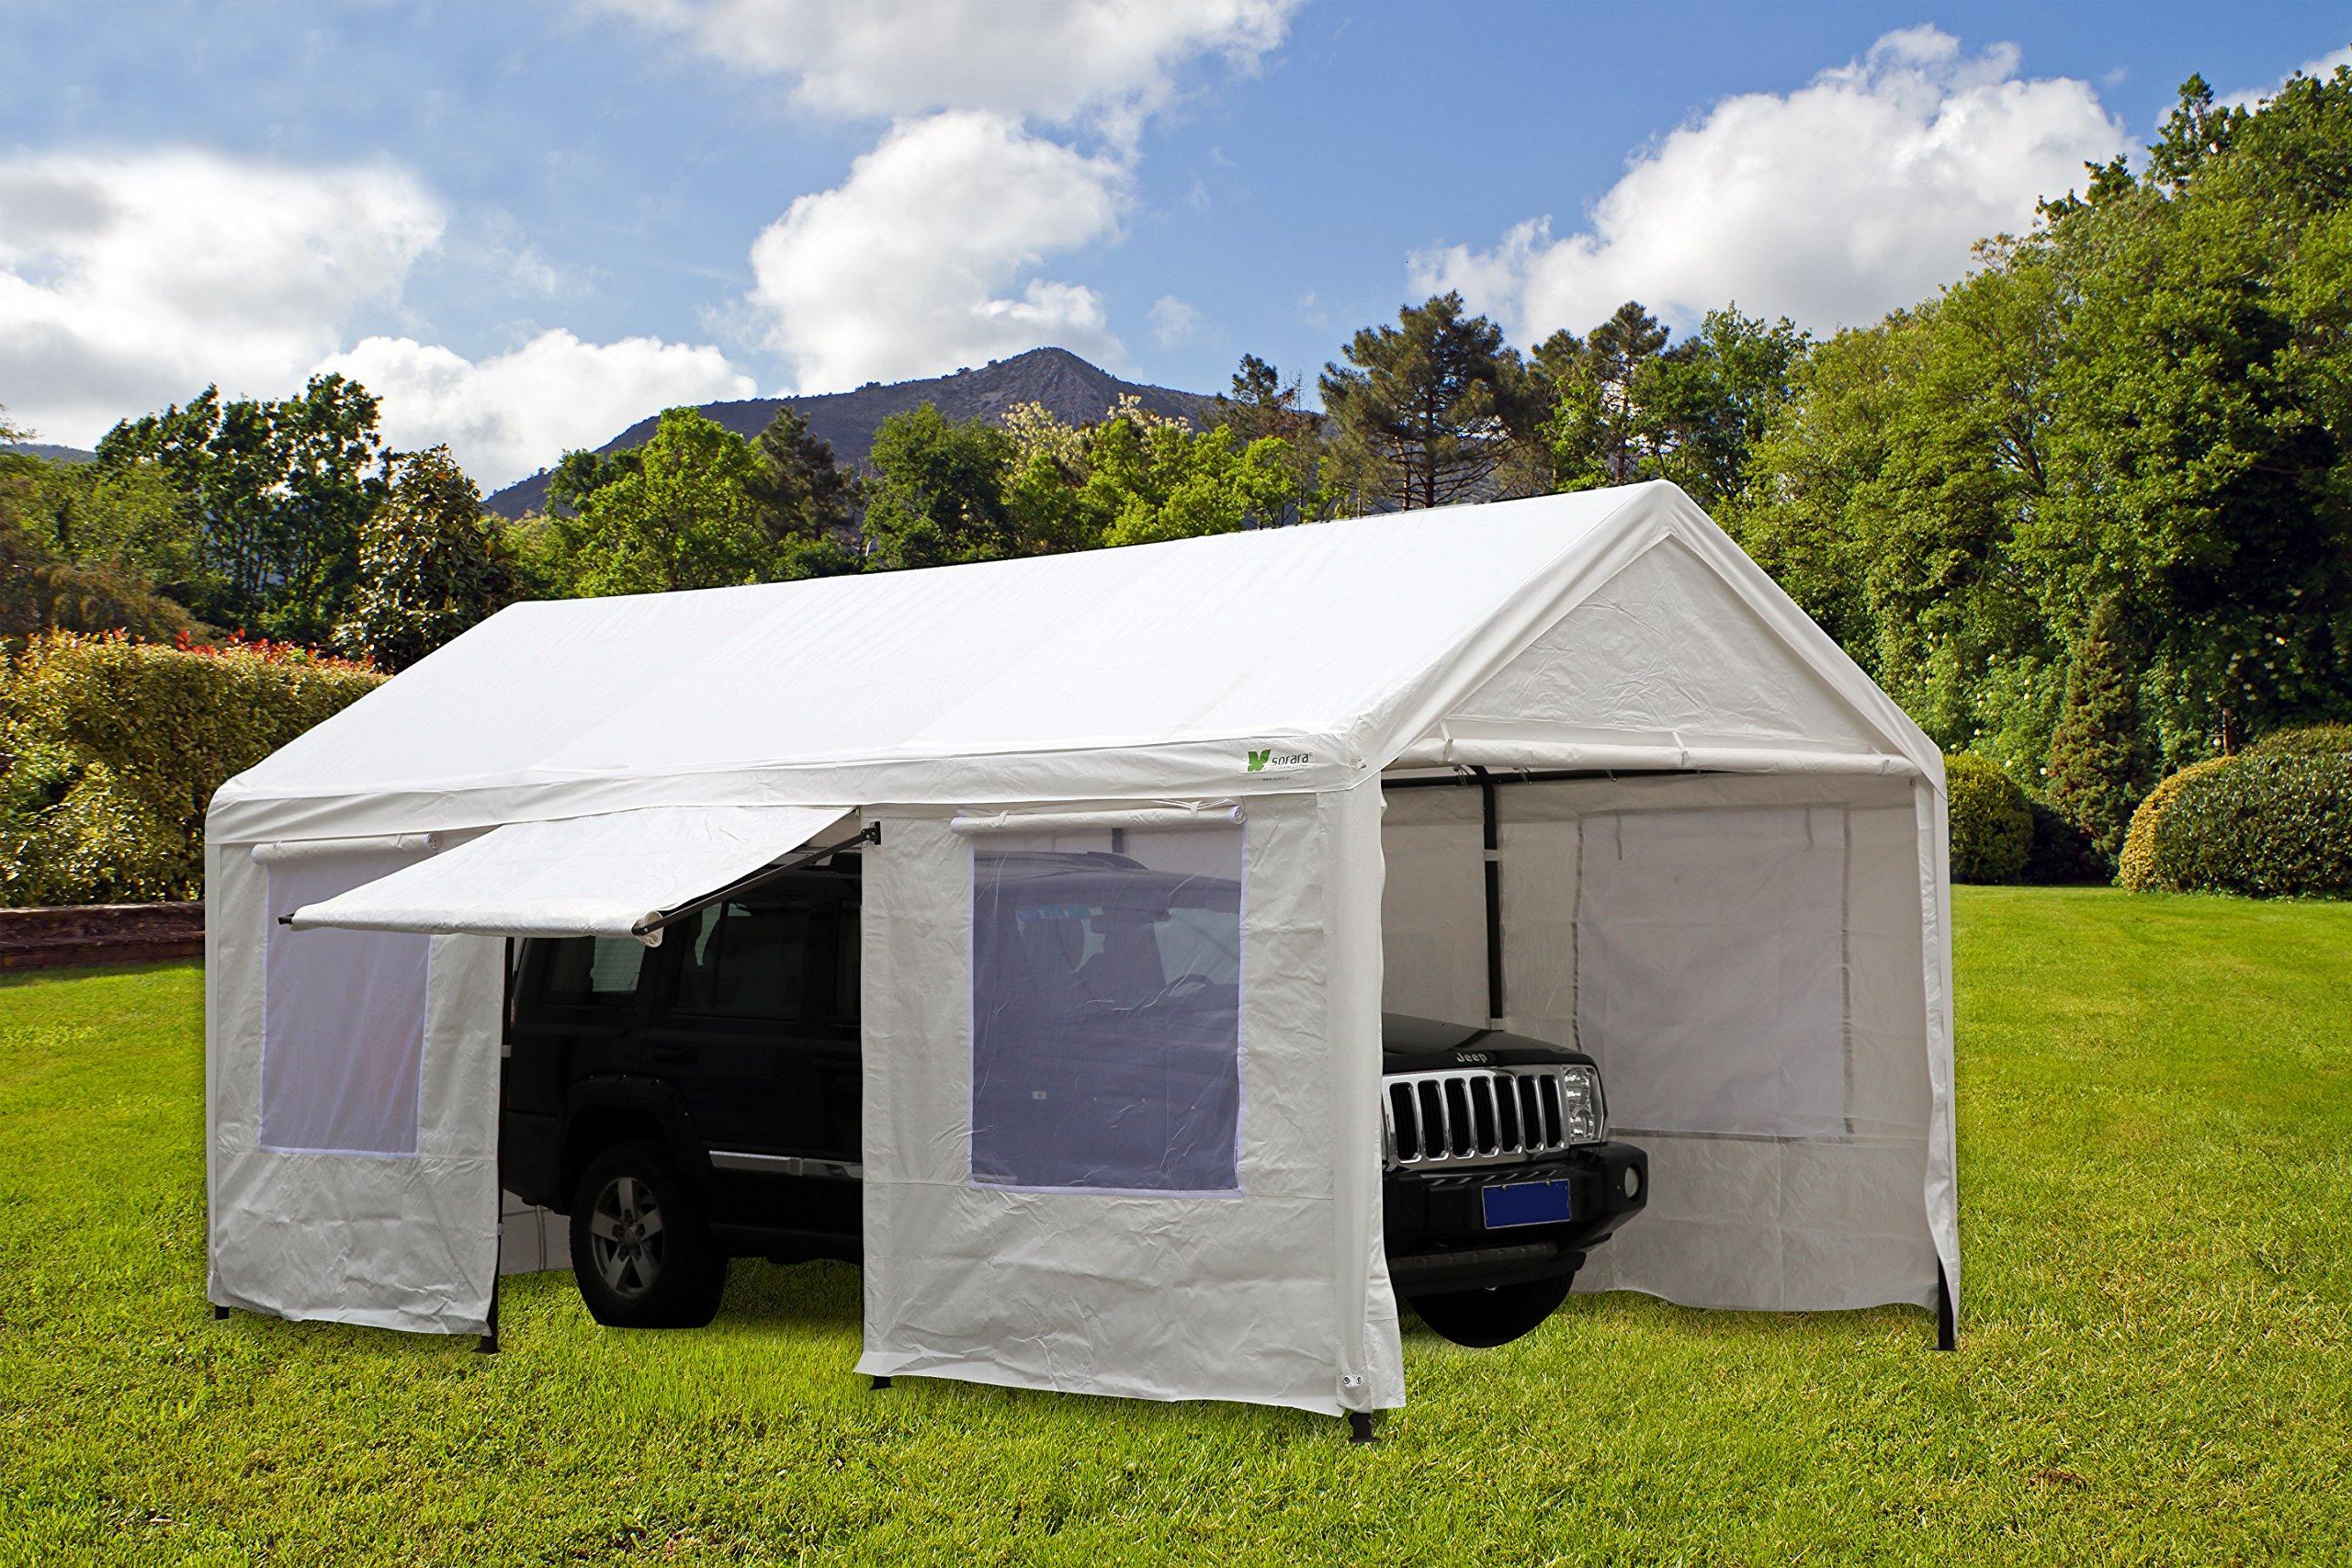 SORARA Carport 10 x 20 ft Heavy Duty Canopy Garage Car Shelter with Windows and Sidewalls, White by SORARA